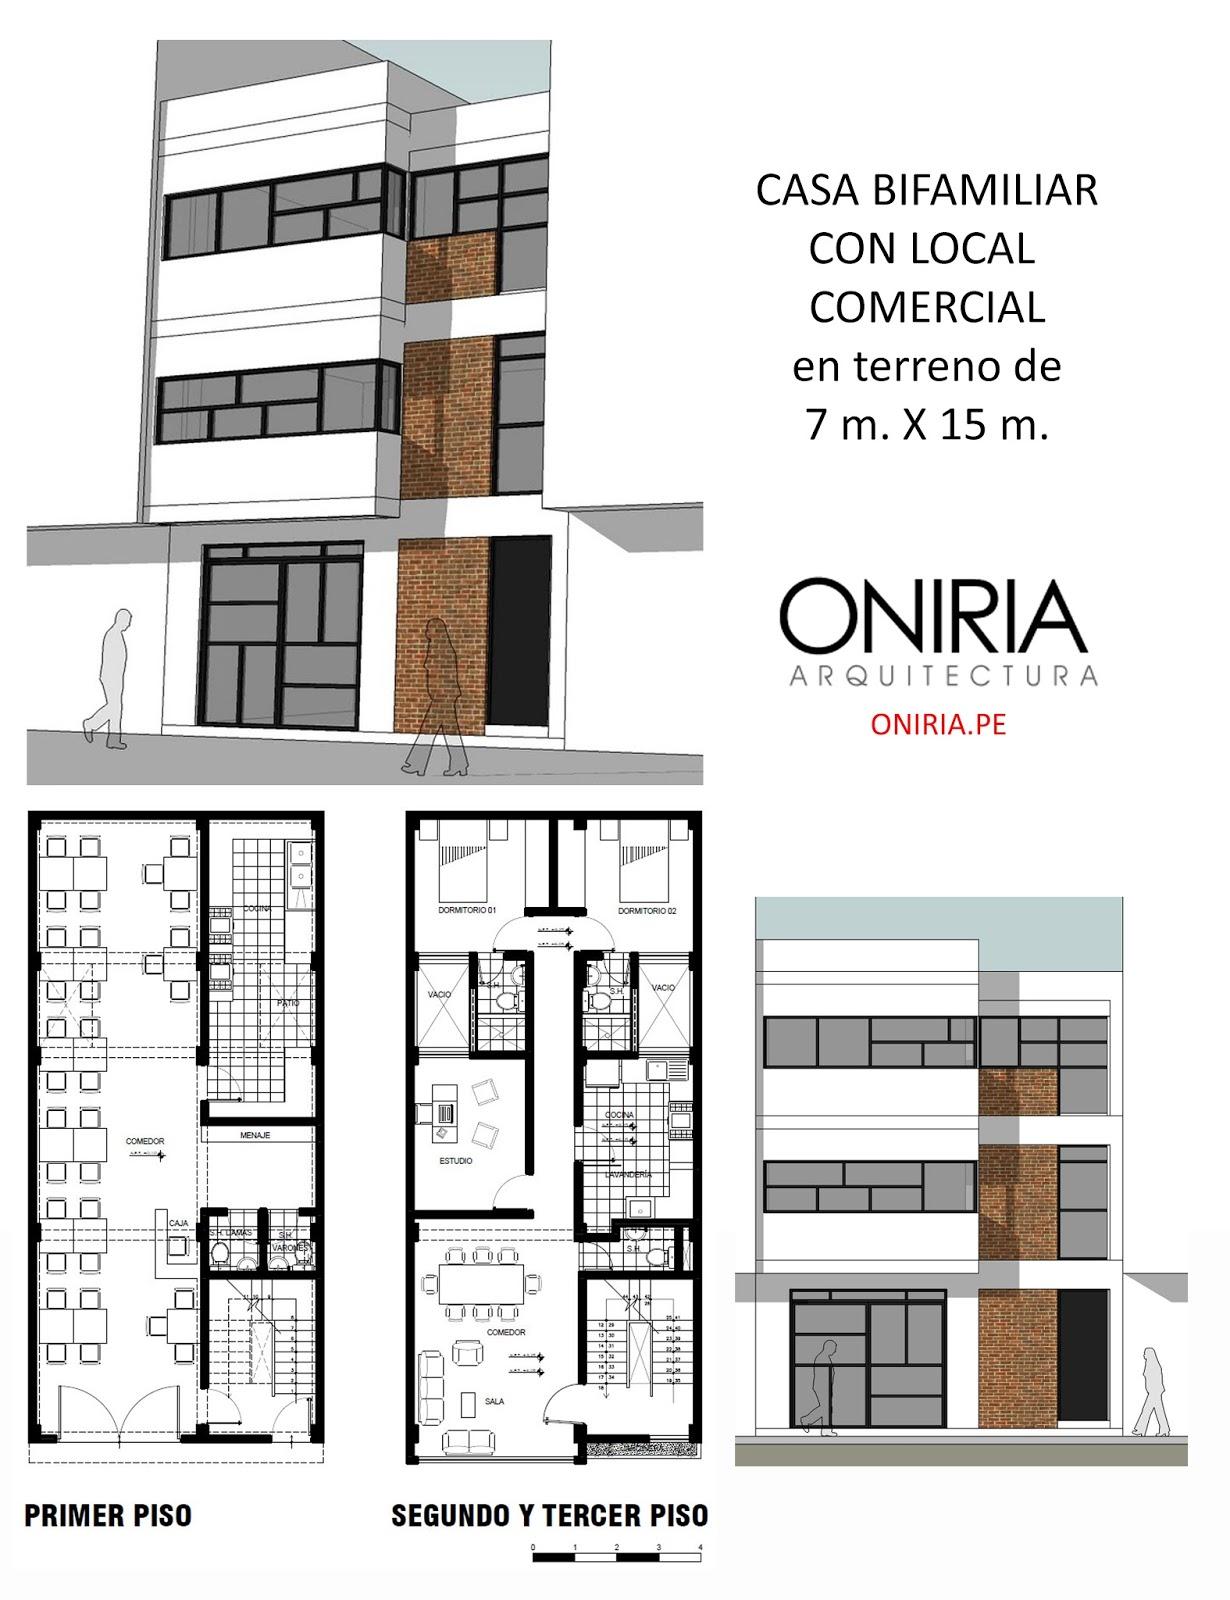 Oniria enero 2016 for Planos de casas 6x20